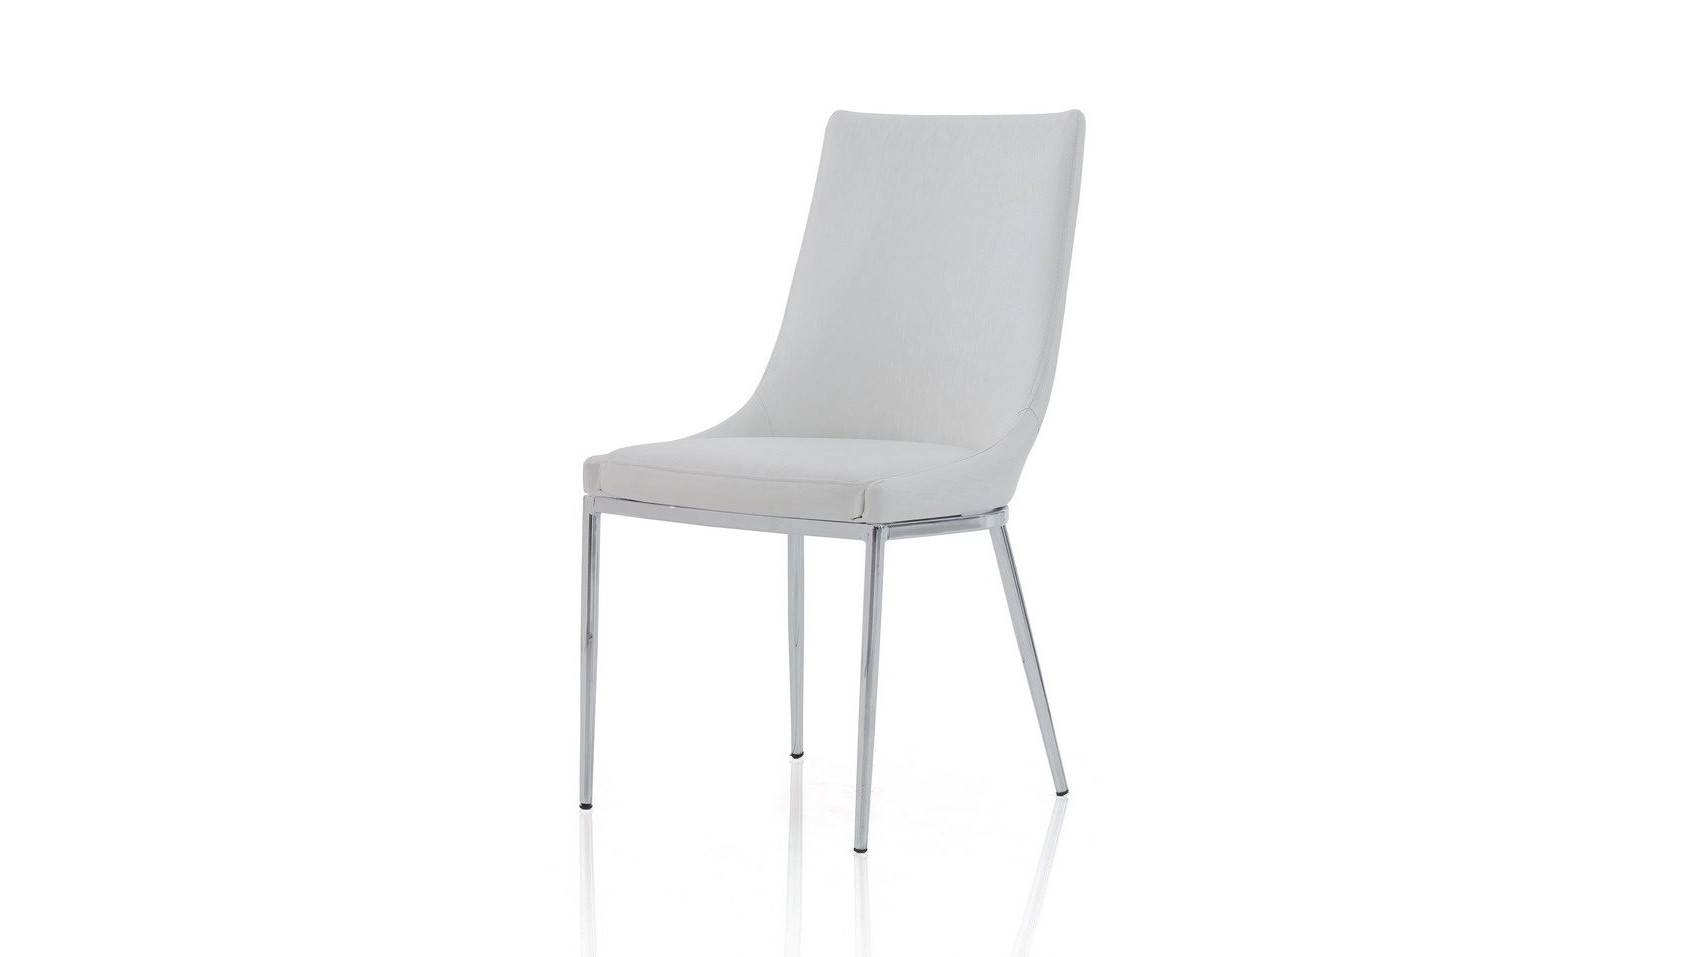 Стул Y-217 белыйОбеденные стулья<br><br><br>Material: Кожа<br>Length см: None<br>Width см: 55<br>Depth см: 47<br>Height см: 86<br>Diameter см: None